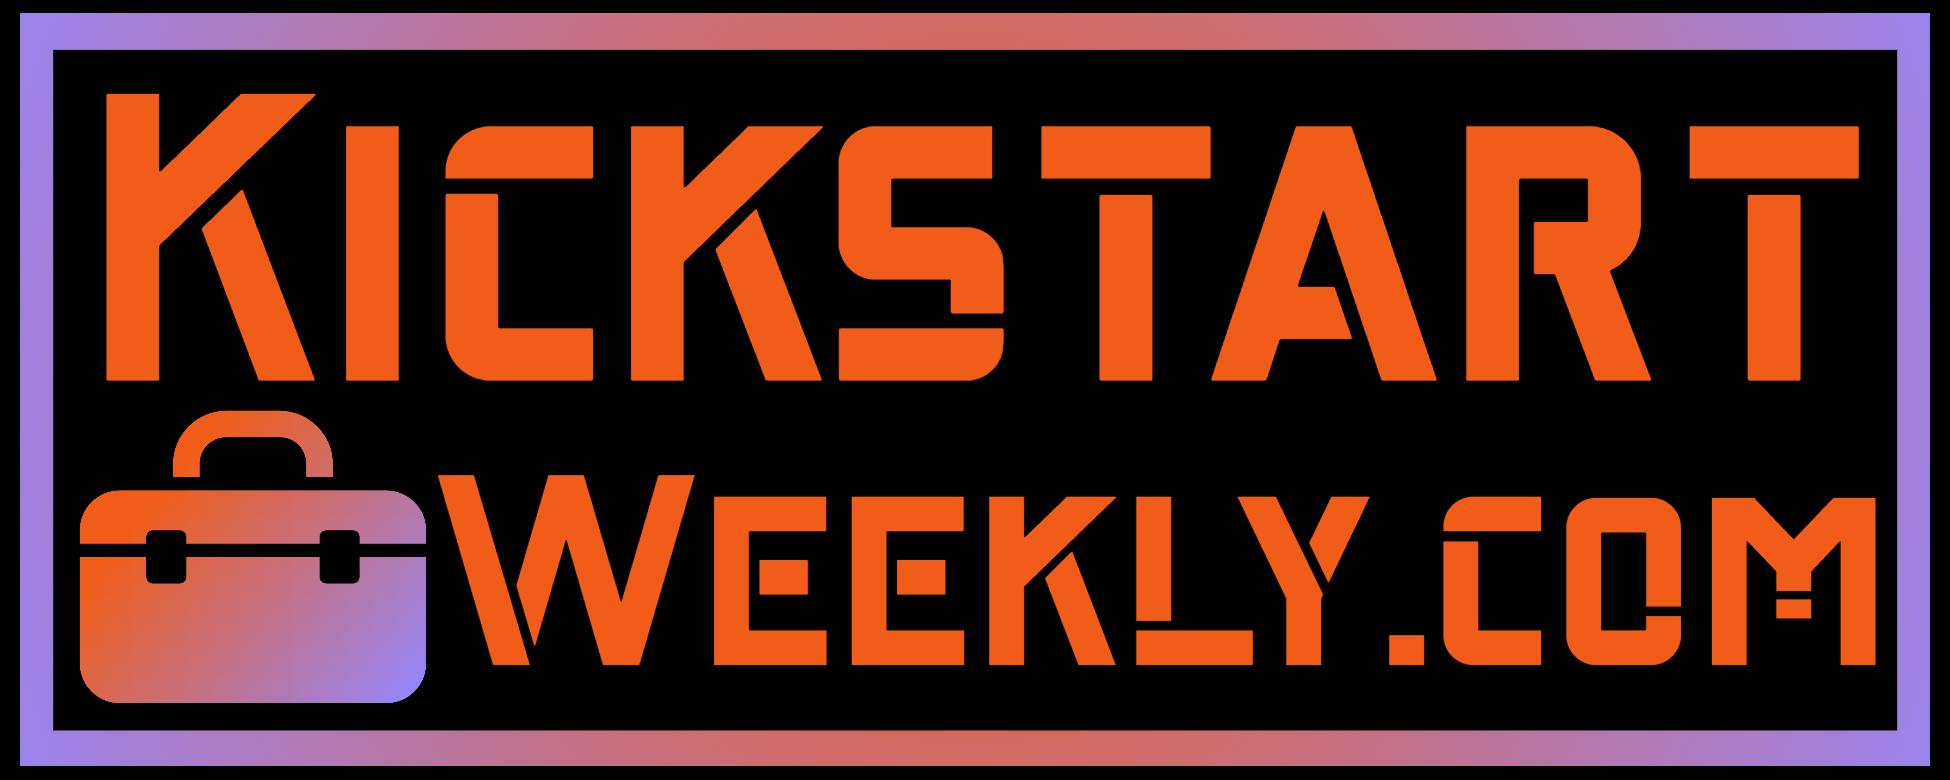 Kickstart Weekly